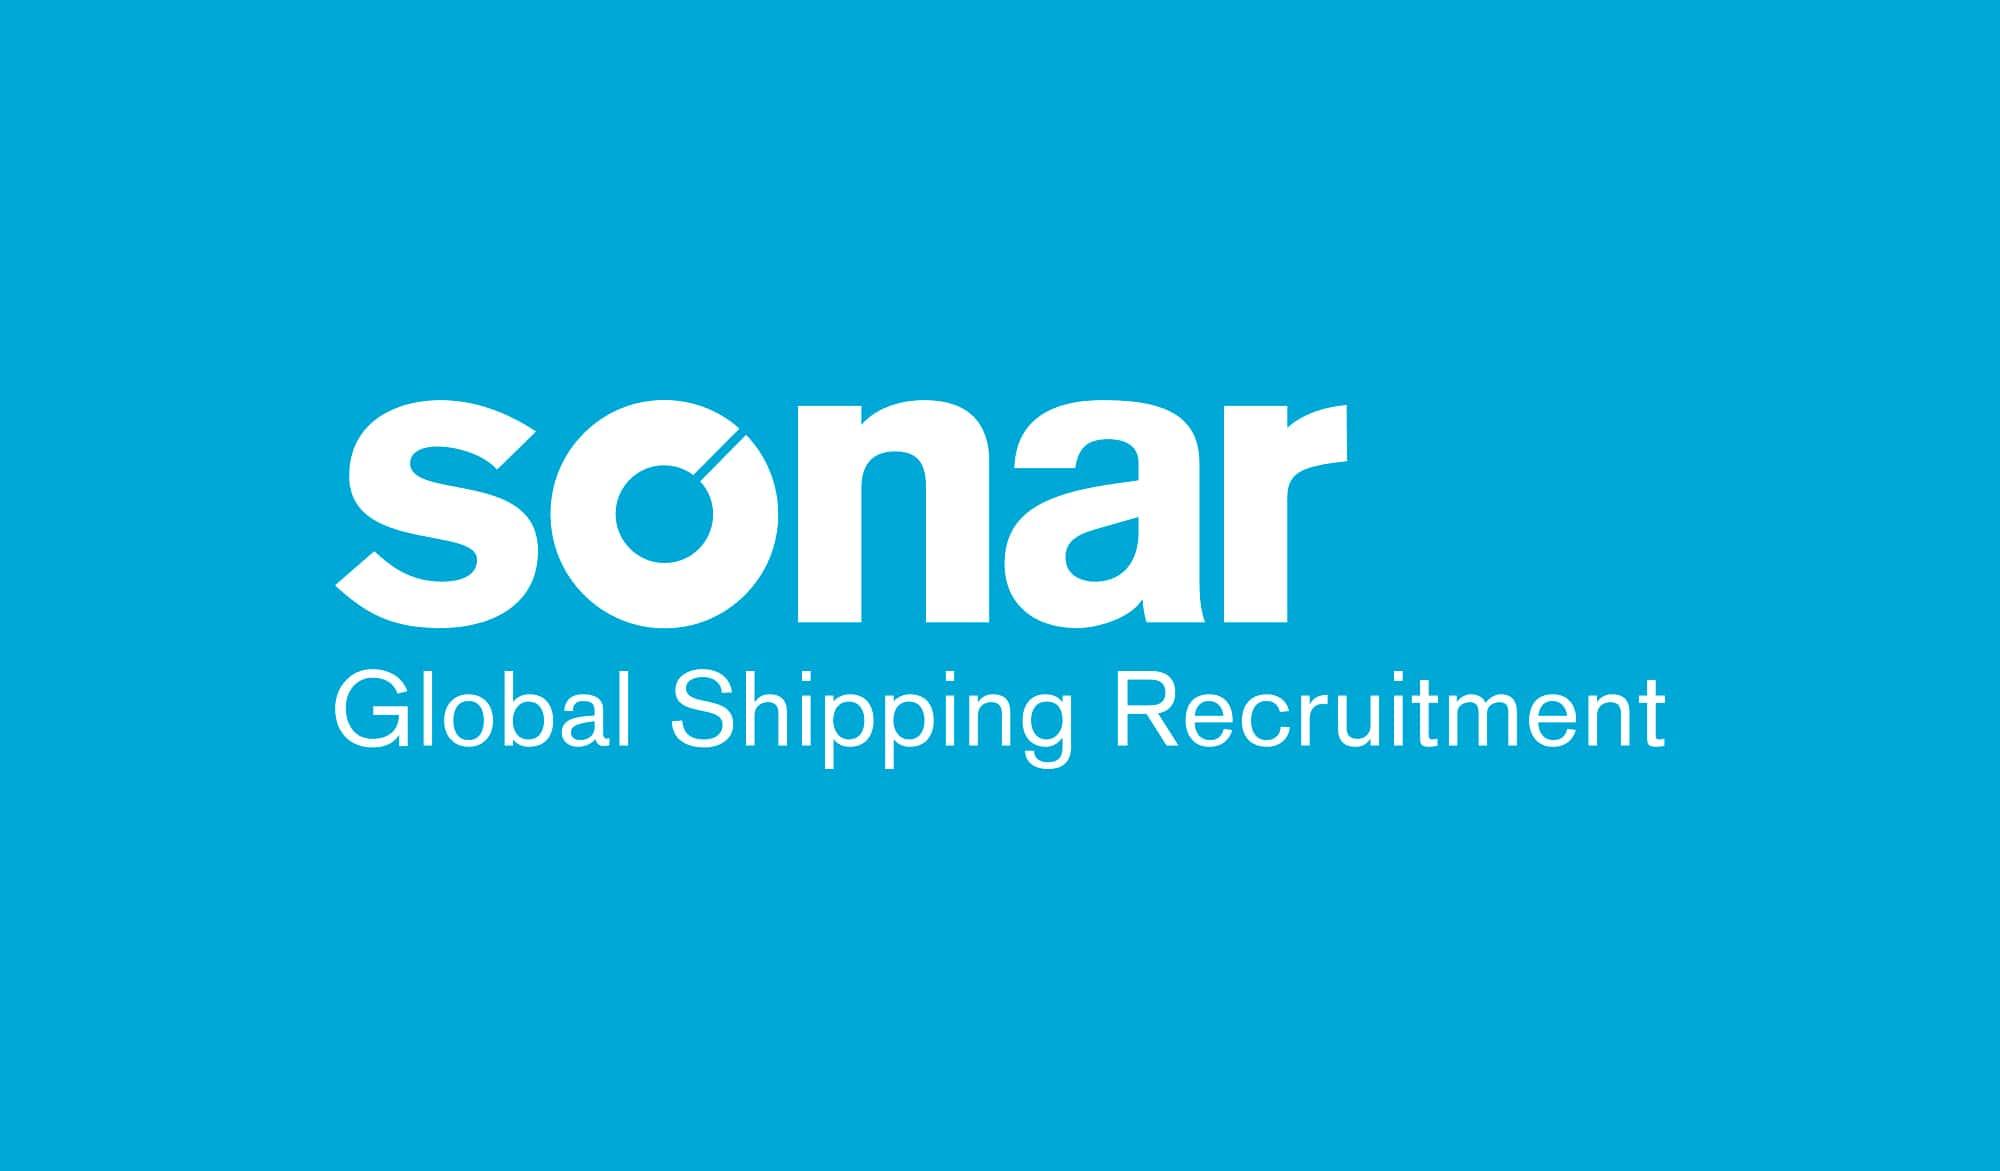 Sonar recruitment logo reversed out